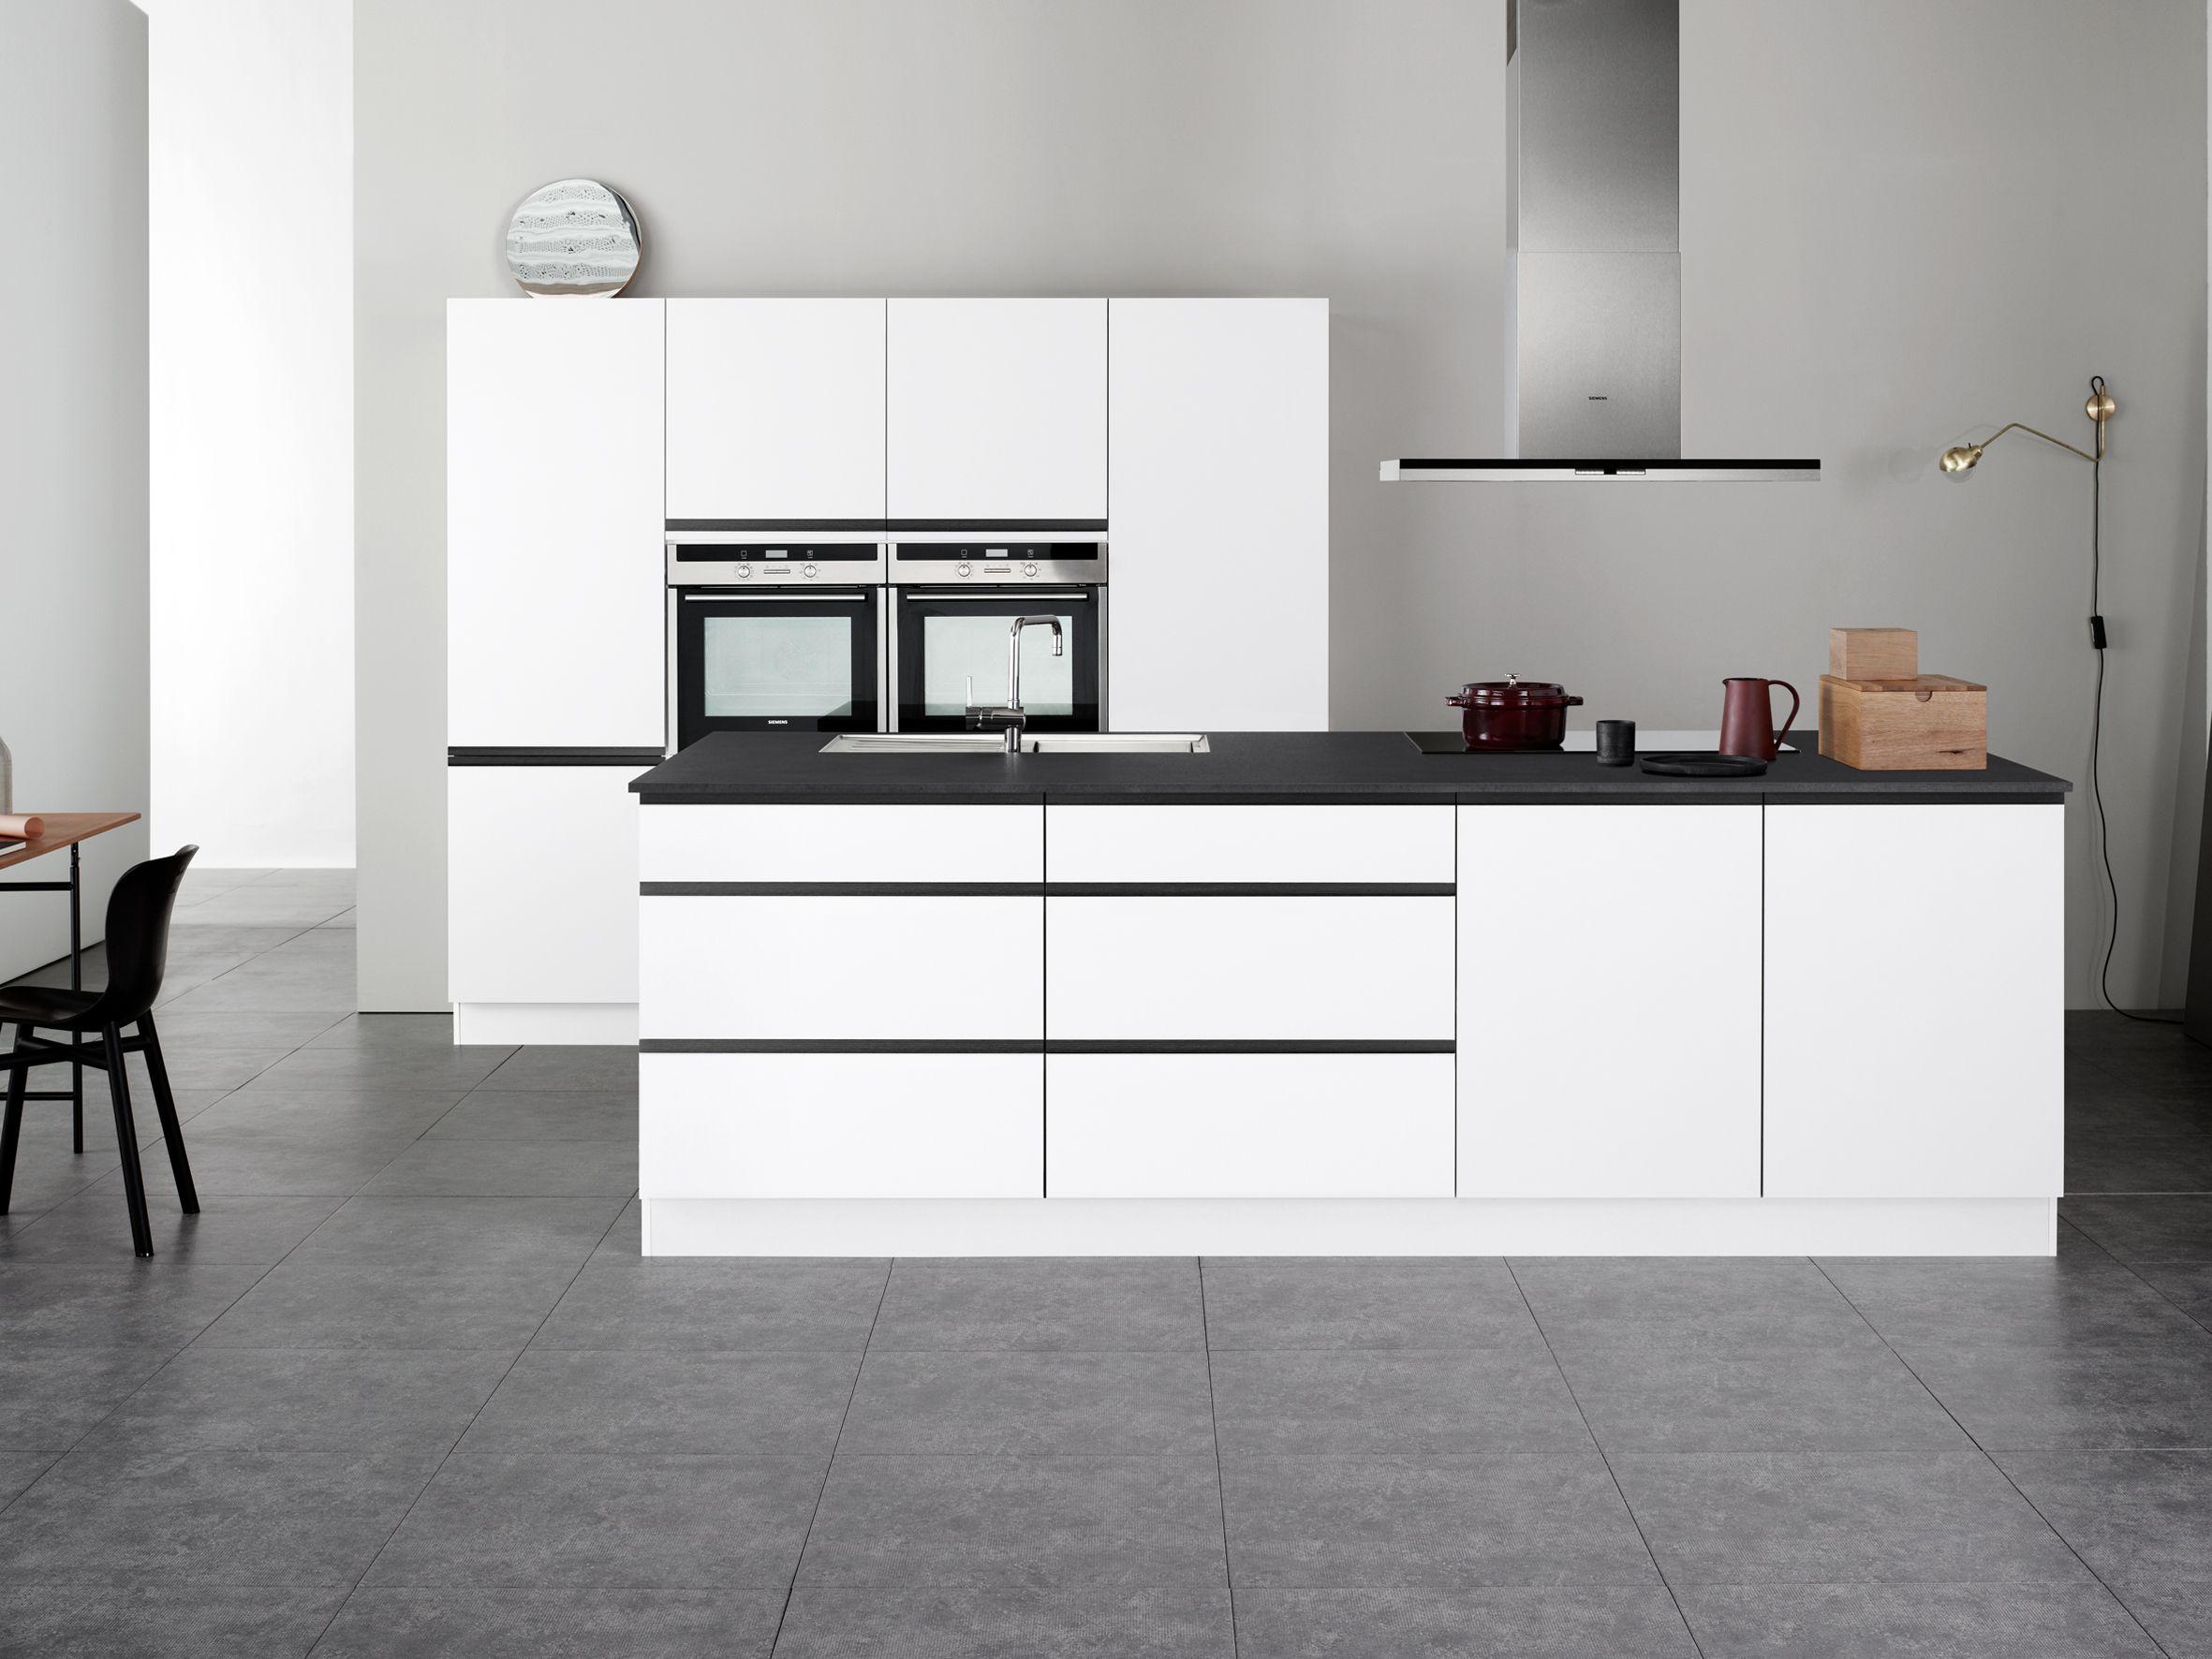 Linea black by kvik other cool kitchens by kvik kitchen